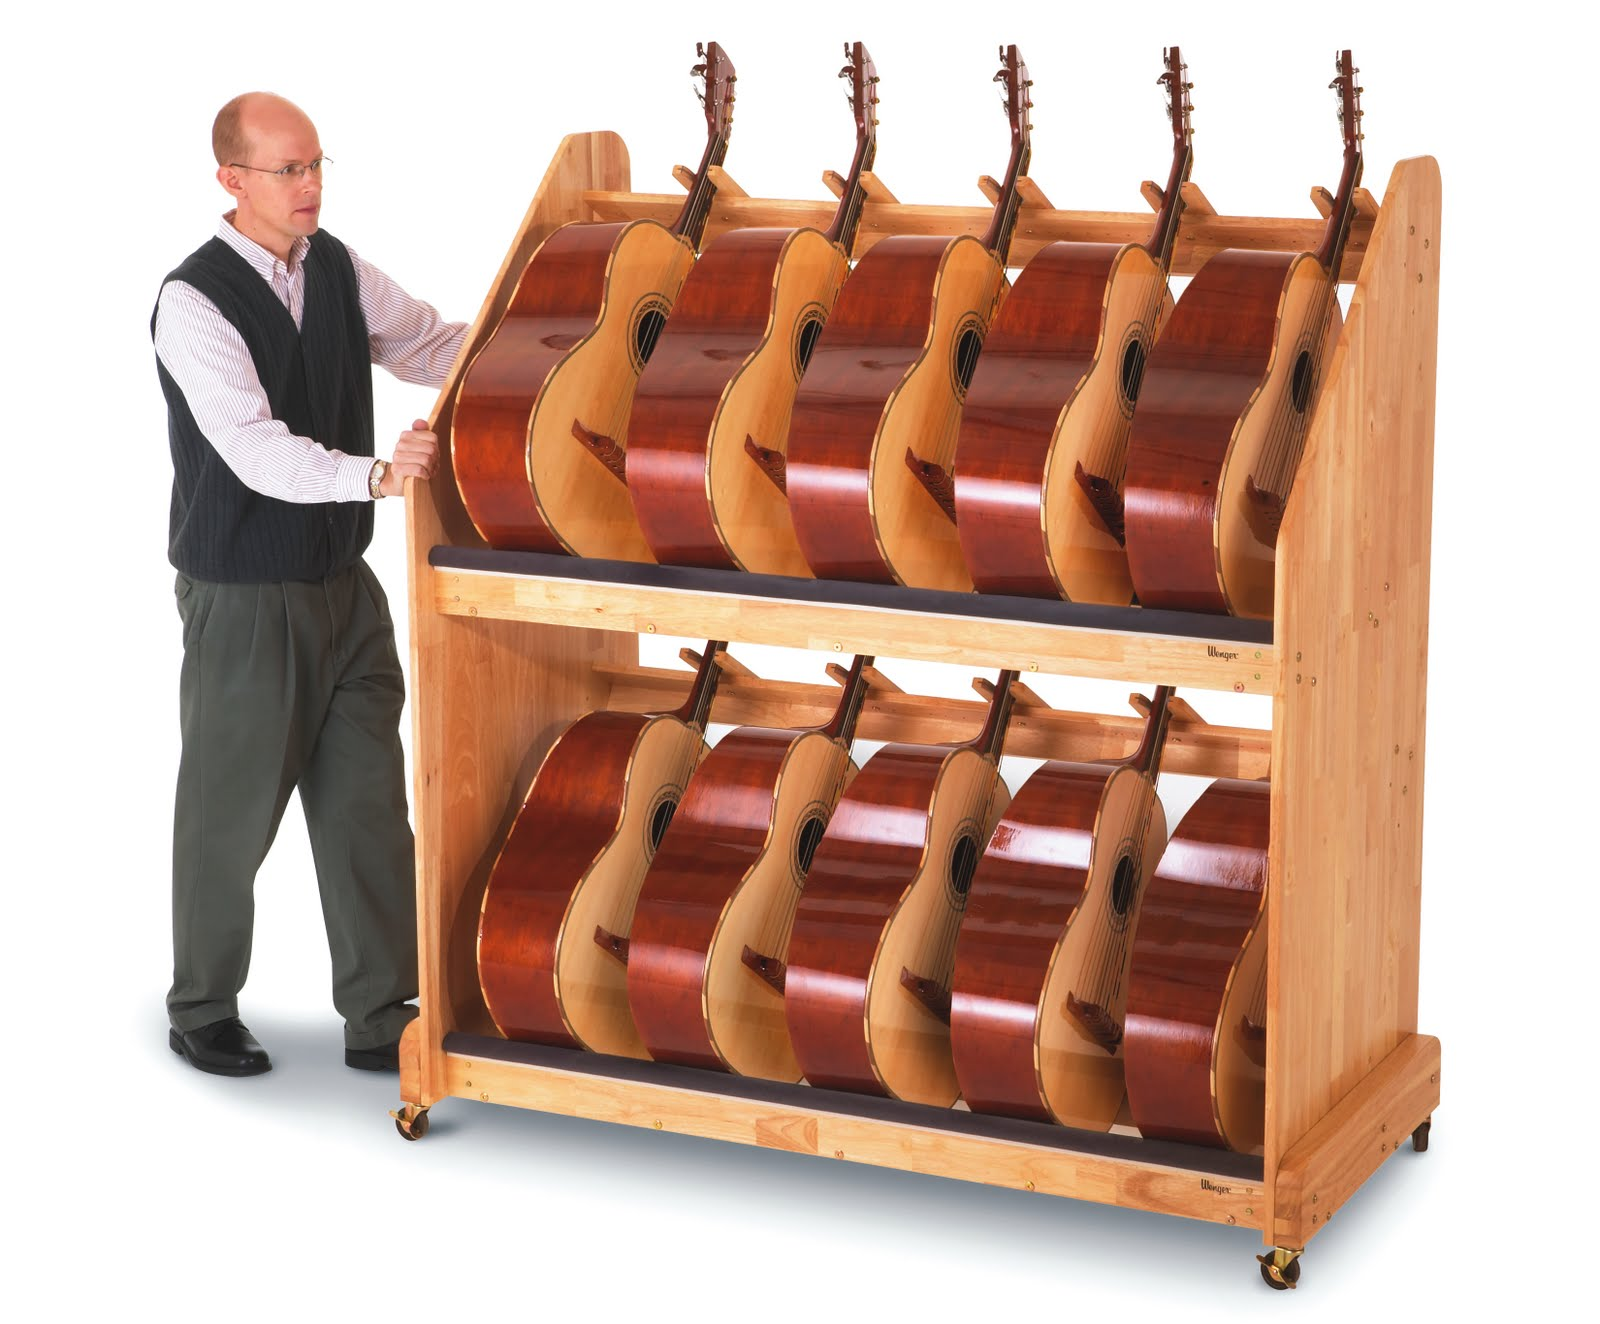 New Guitar Storage Rack Makes For Easy Transportation